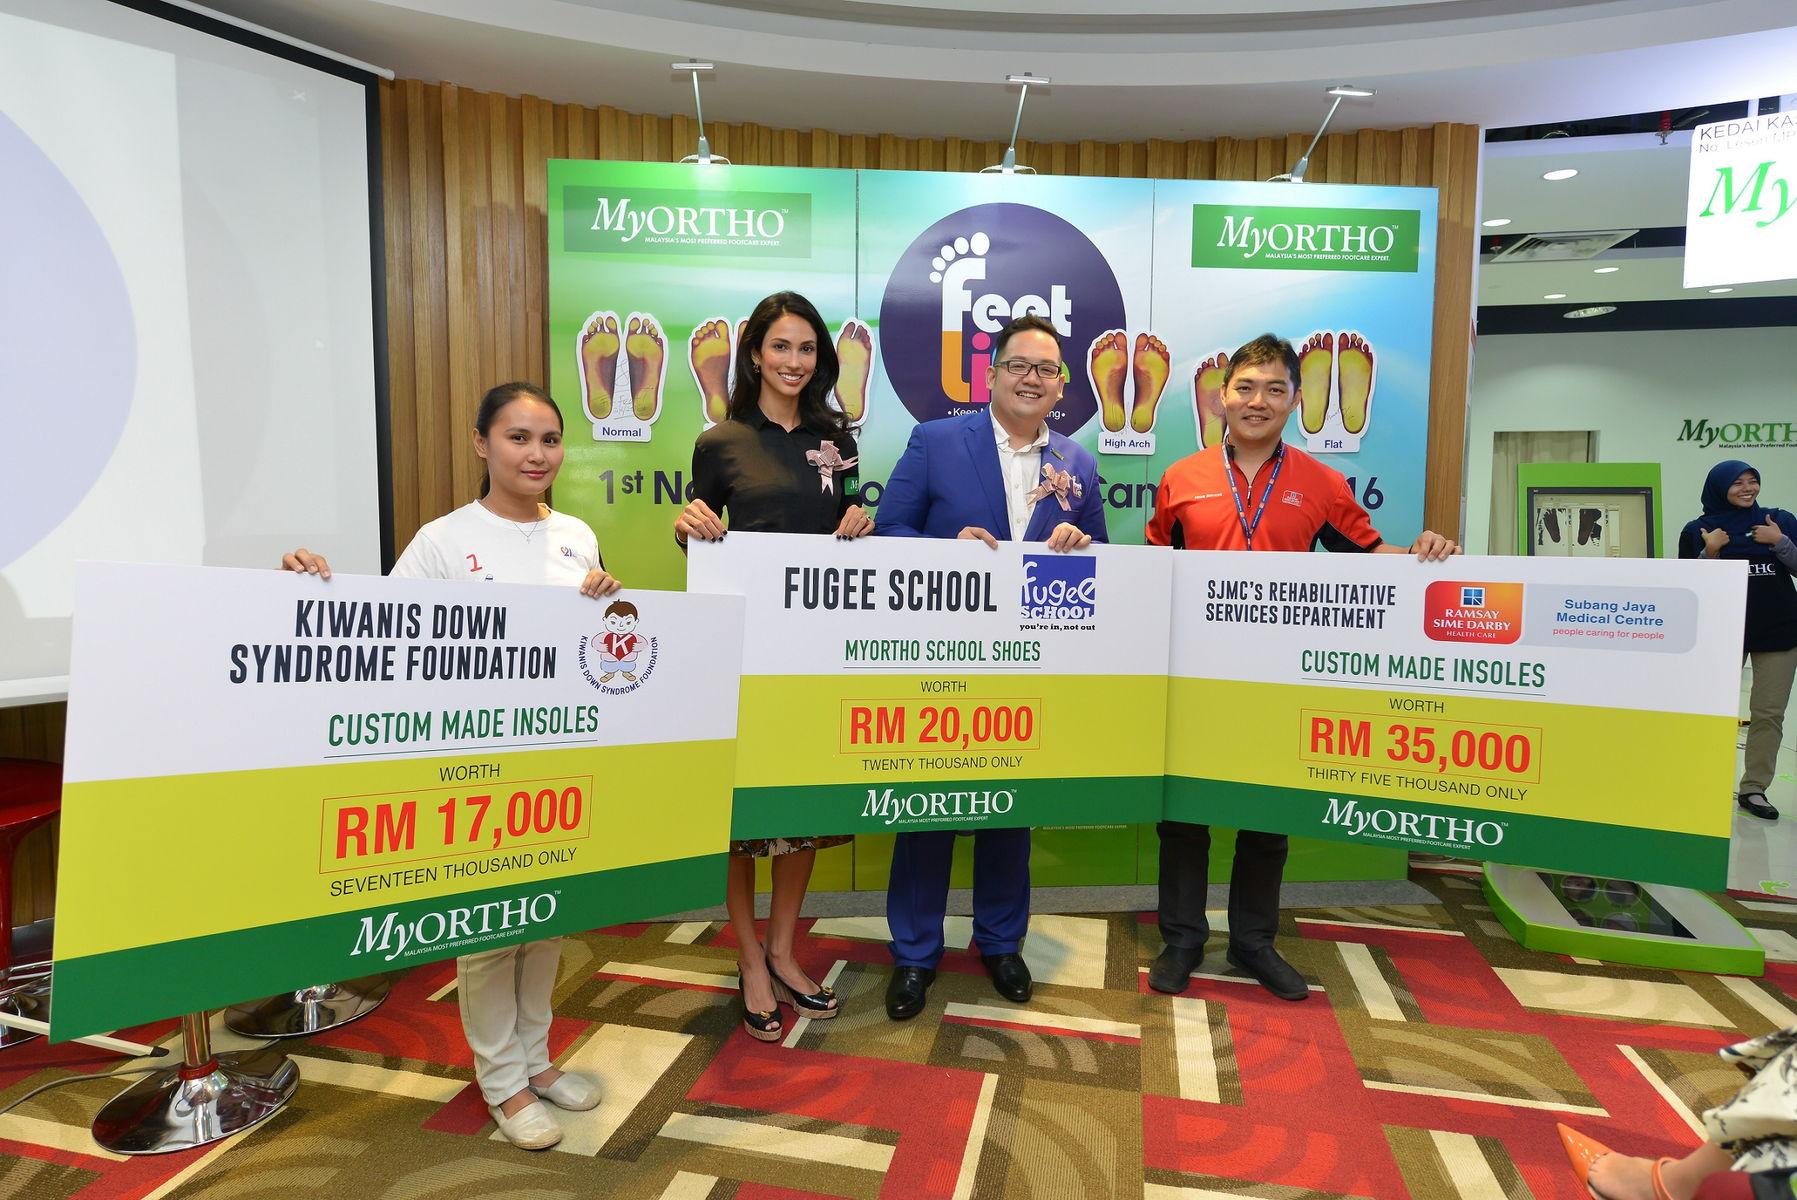 MyOrtho making RM70,000 contribution to Kiwanis, SJMC _ Fugee School.